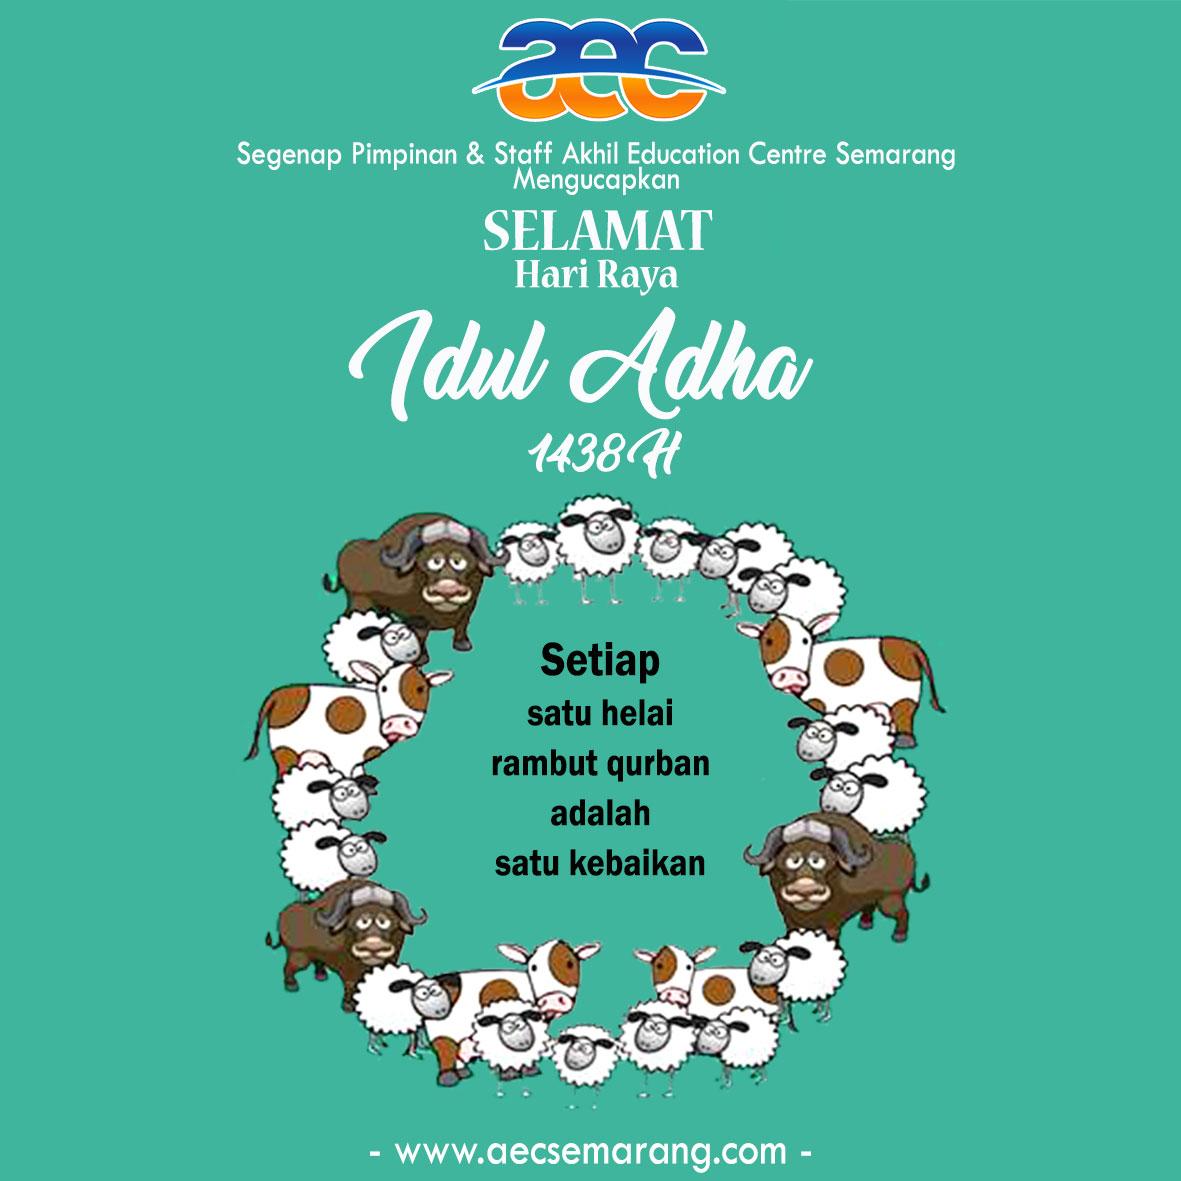 Selamat Hari Raya Idul Adha …..